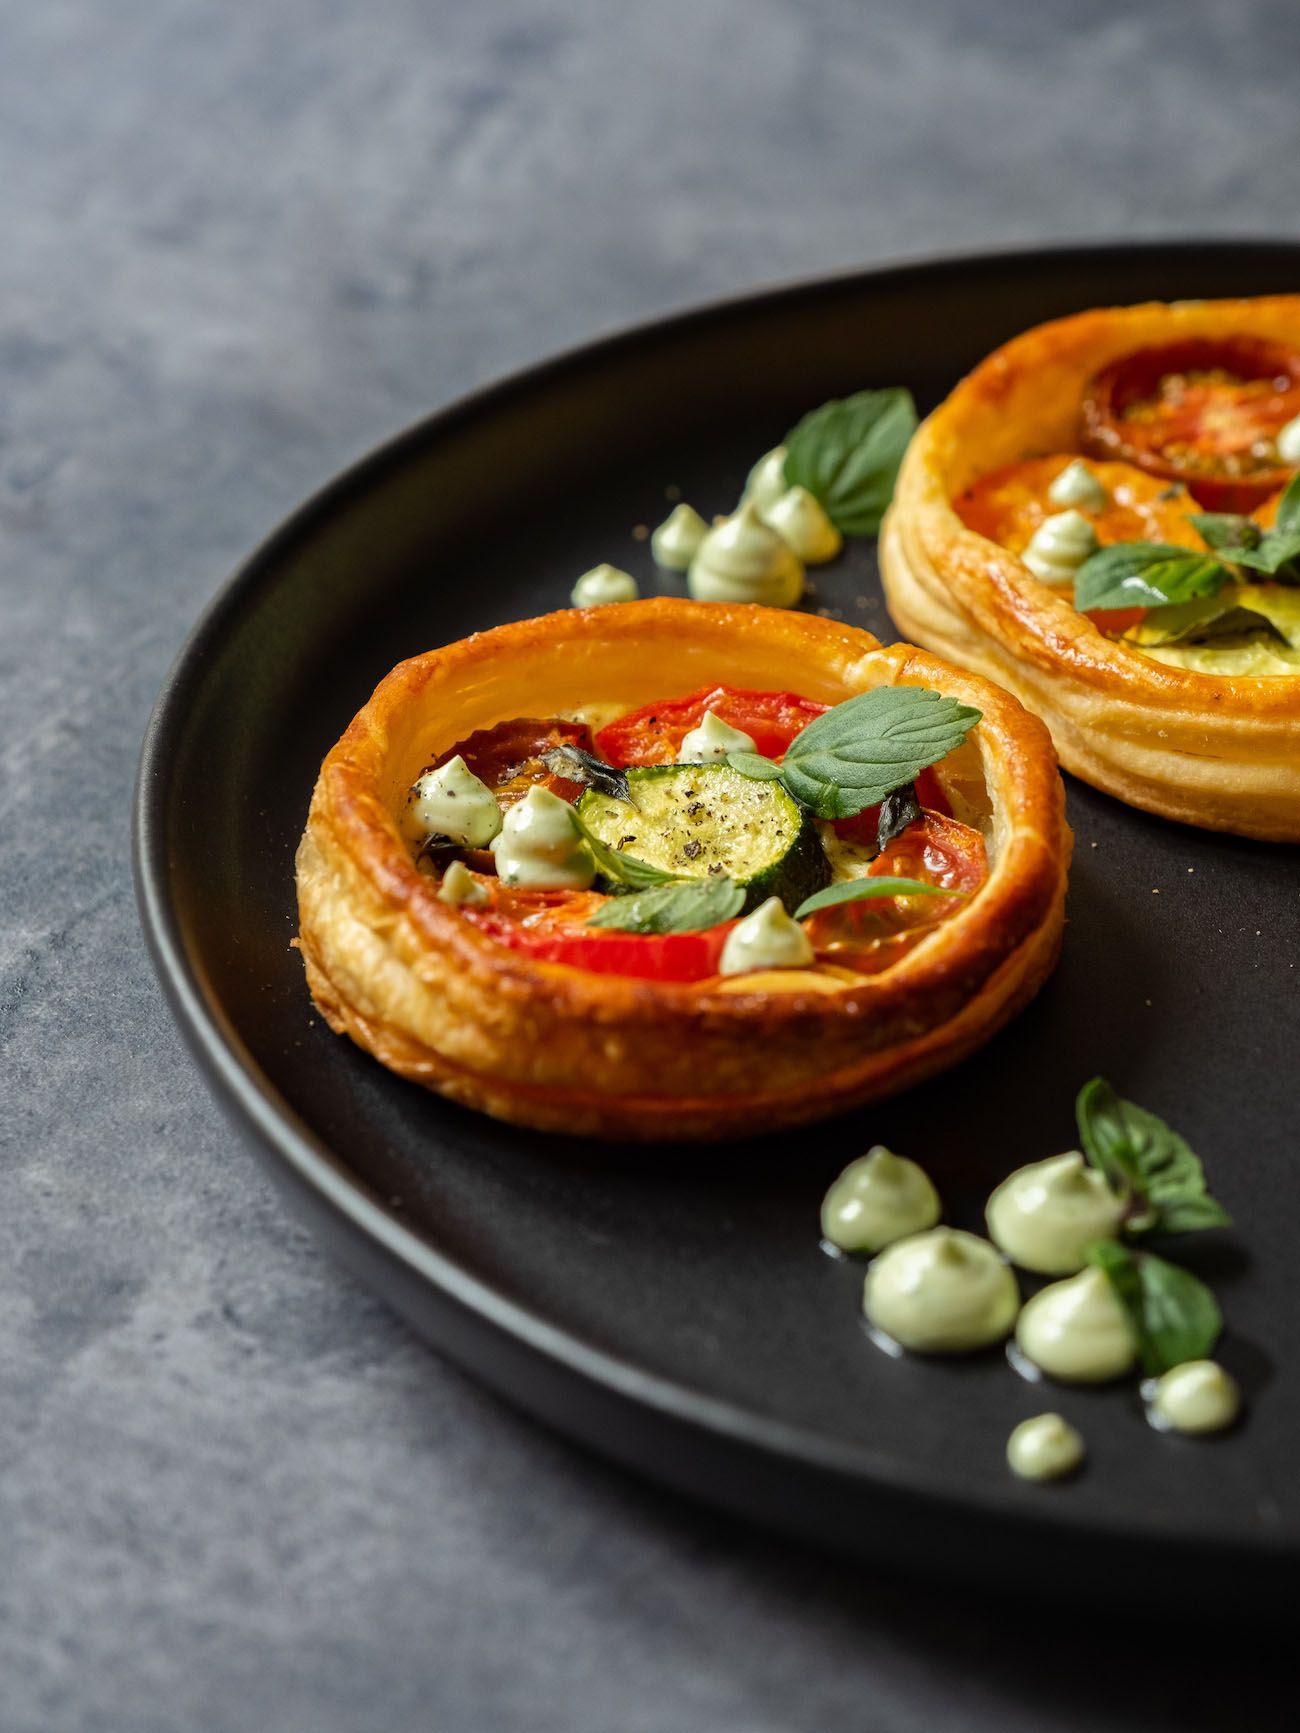 Rezept, Foodblog, About Fuel, Tomaten Zucchini Tartelettes mit Basilikum Feta Creme, Blätterteig, Teller, Pfeffer